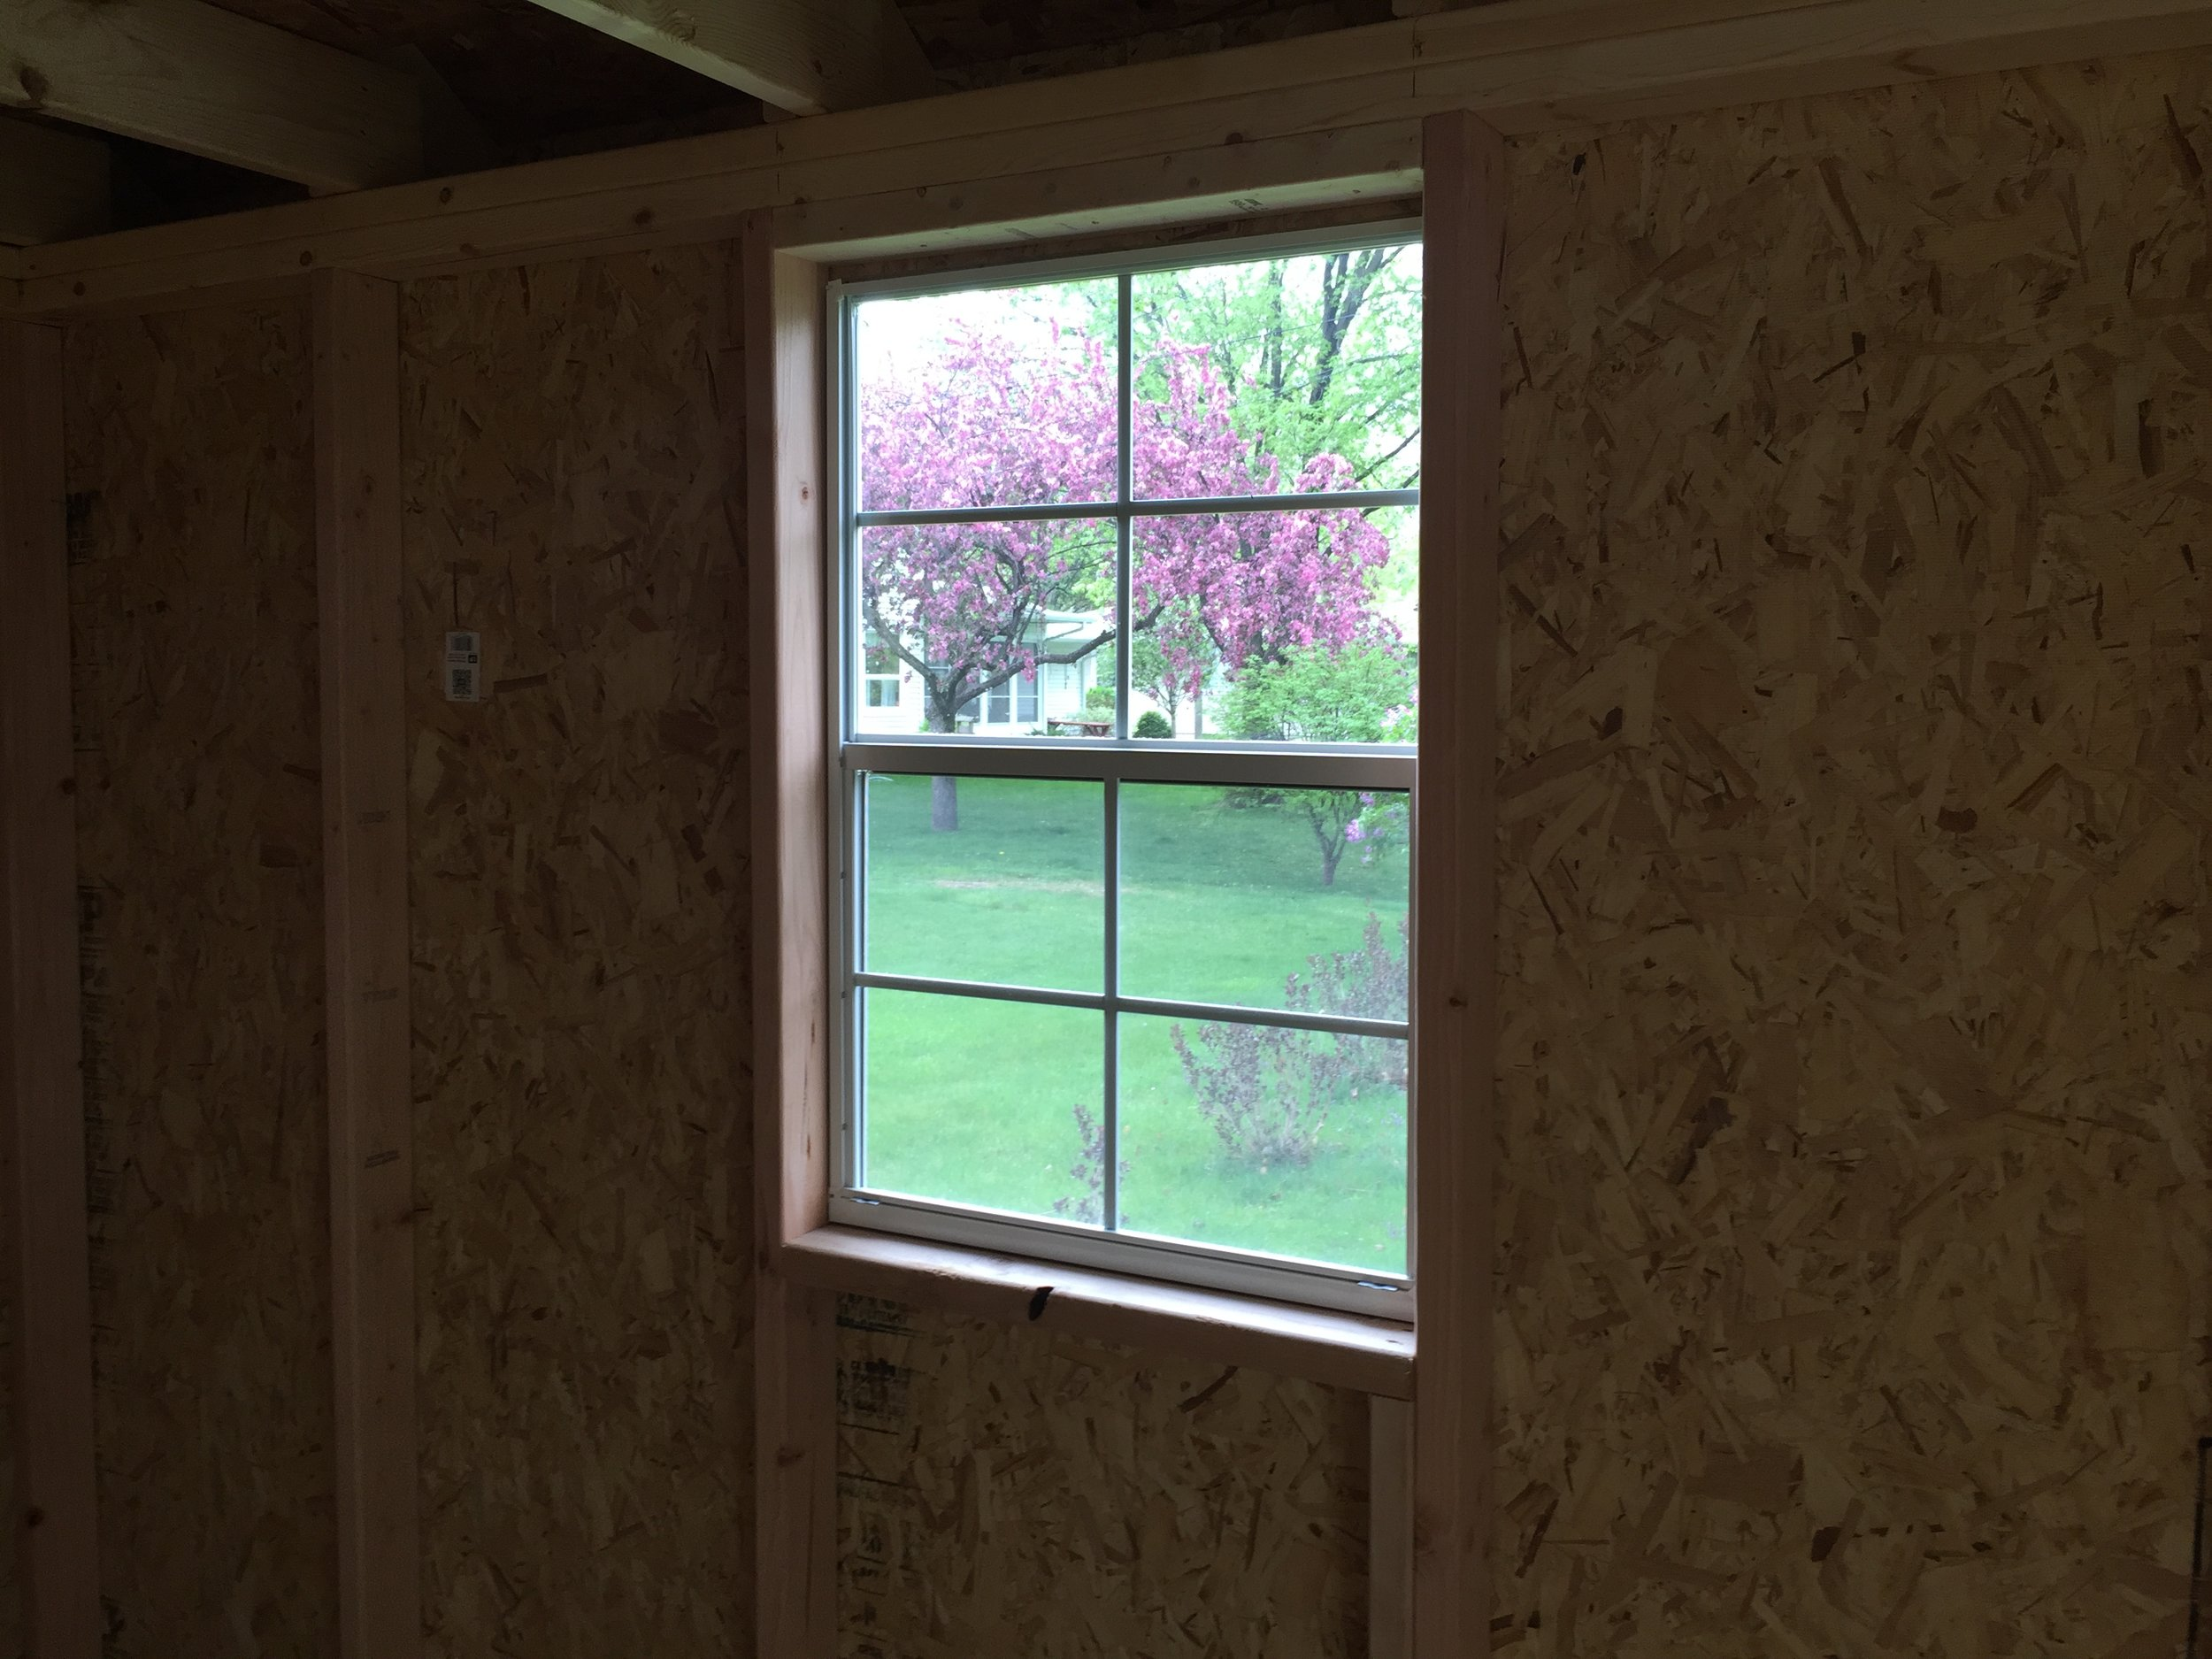 24x36 Window Interior View